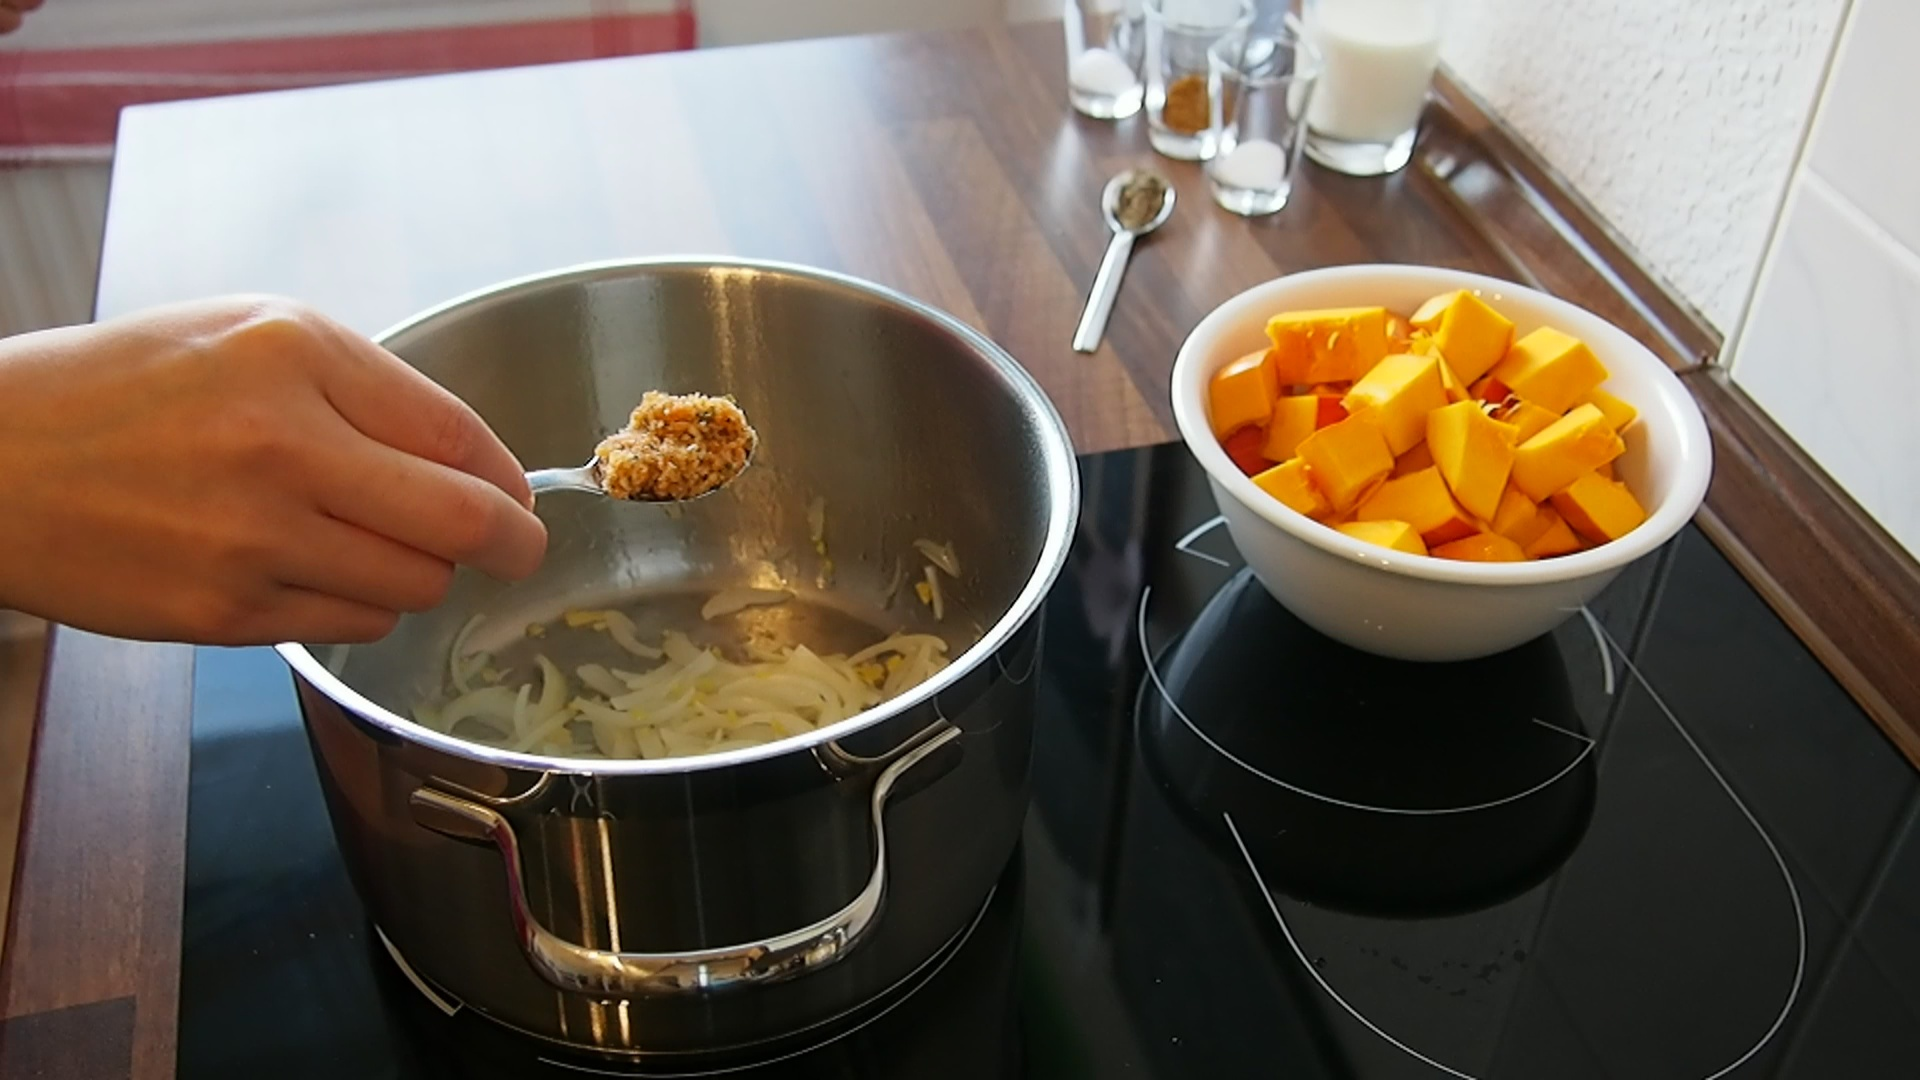 2014-10-27-Kürbis-Curry-Suppe-16.jpg